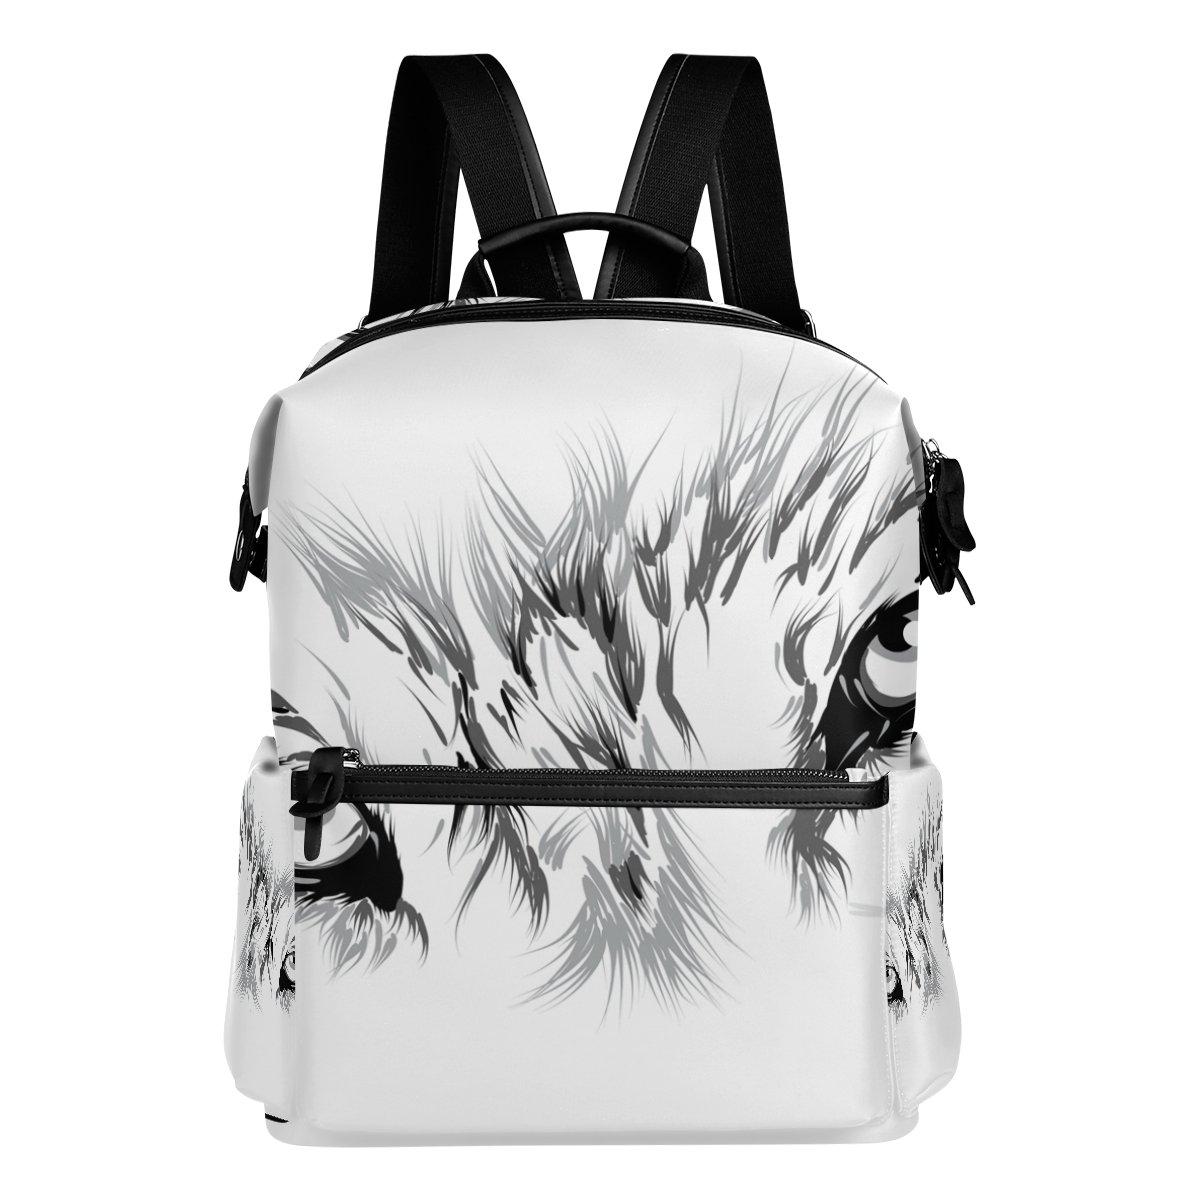 COOSUN Escuela de cara Mochila mochila Blanco de viaje de Blanco mochila y negro Lobo Multi fd601c